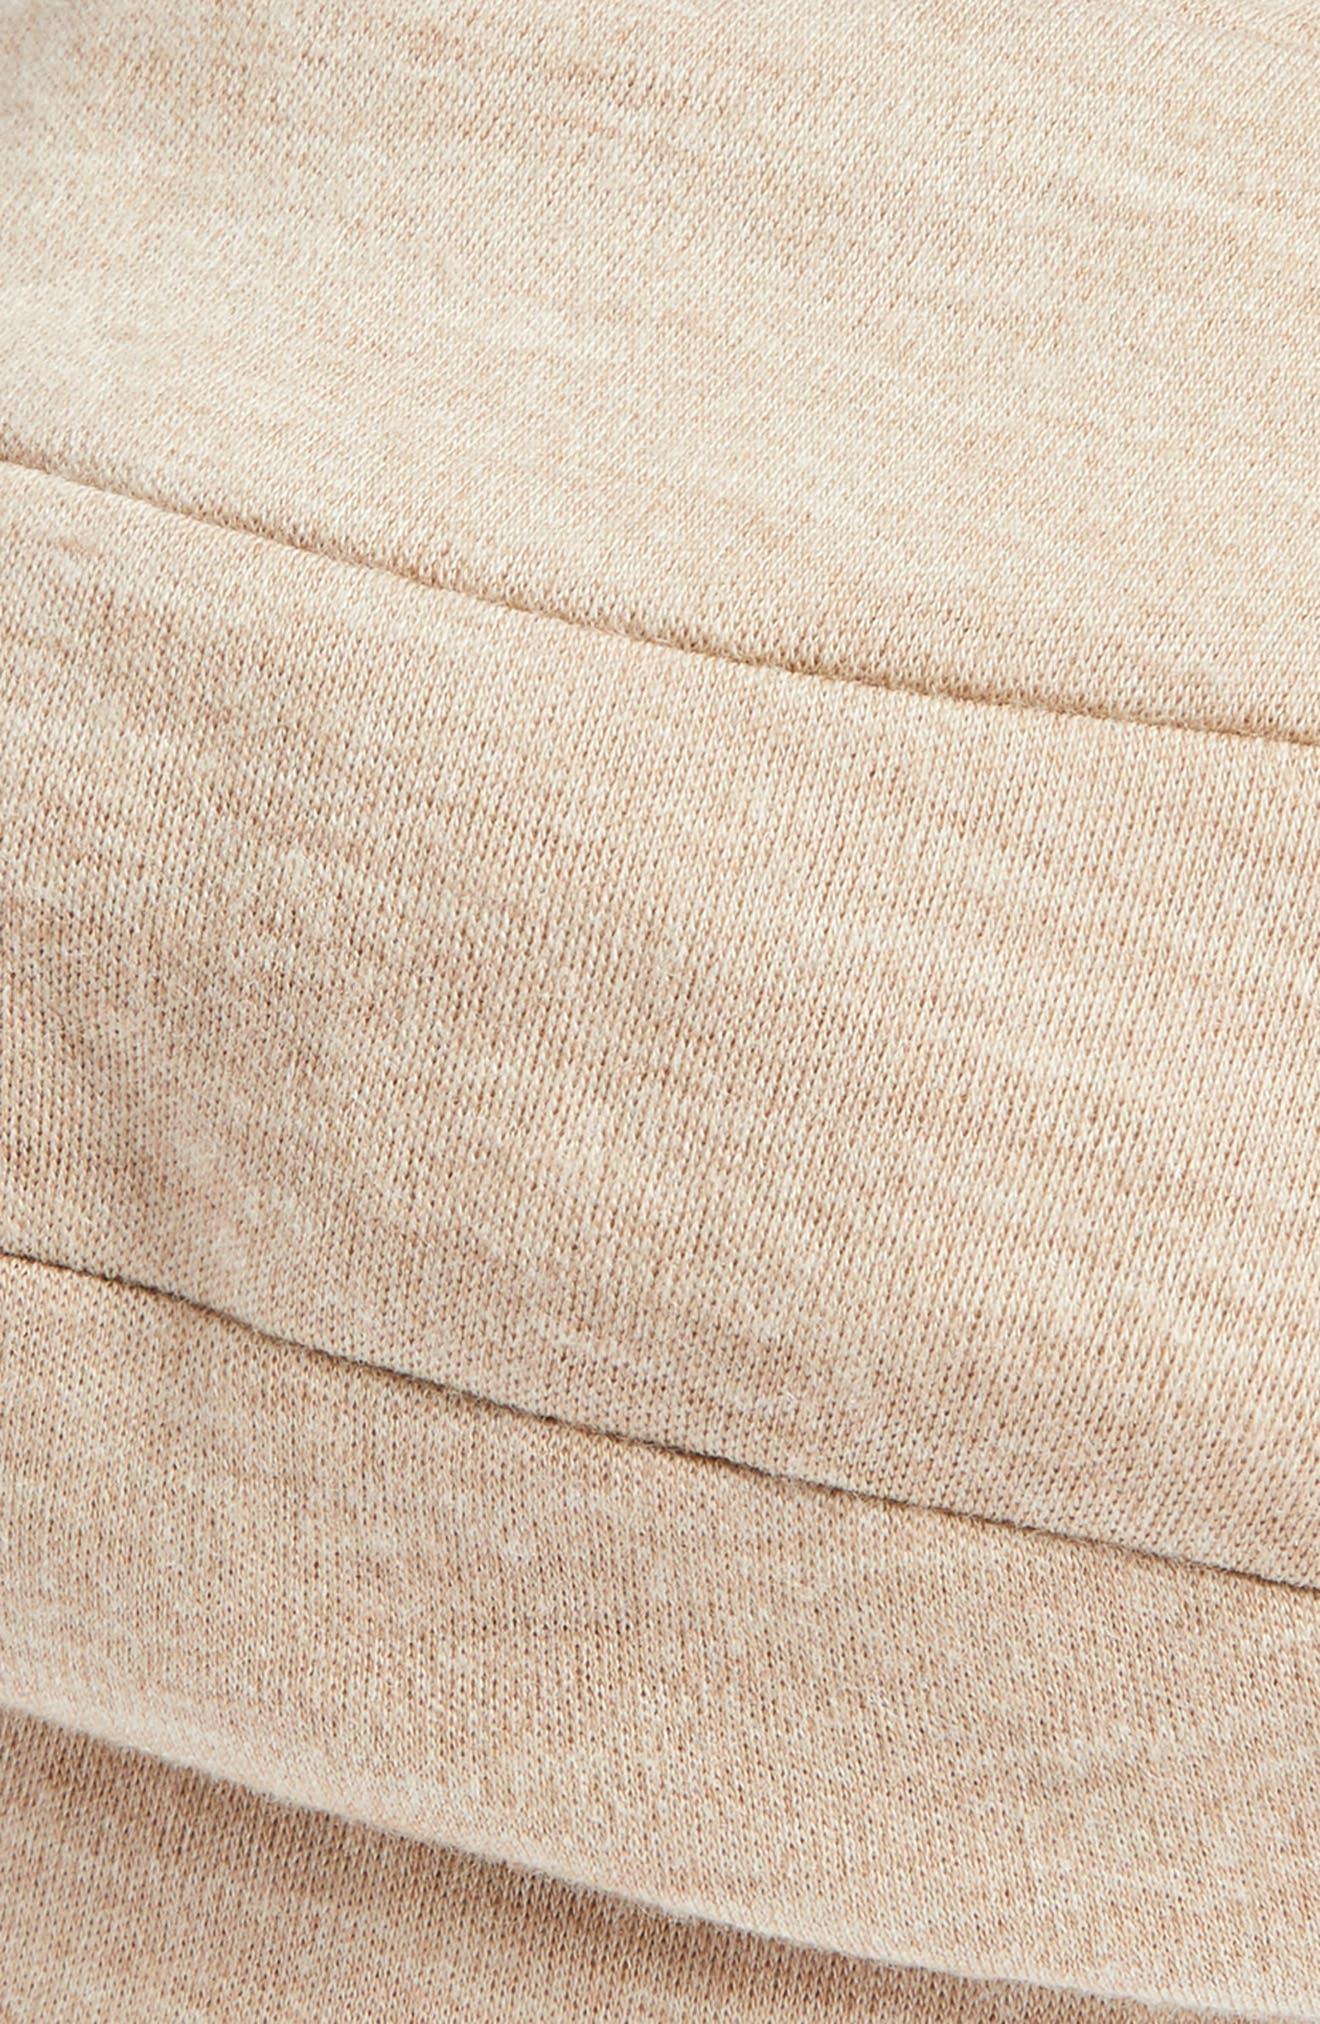 Wool Blend Jersey Beret,                             Alternate thumbnail 2, color,                             200